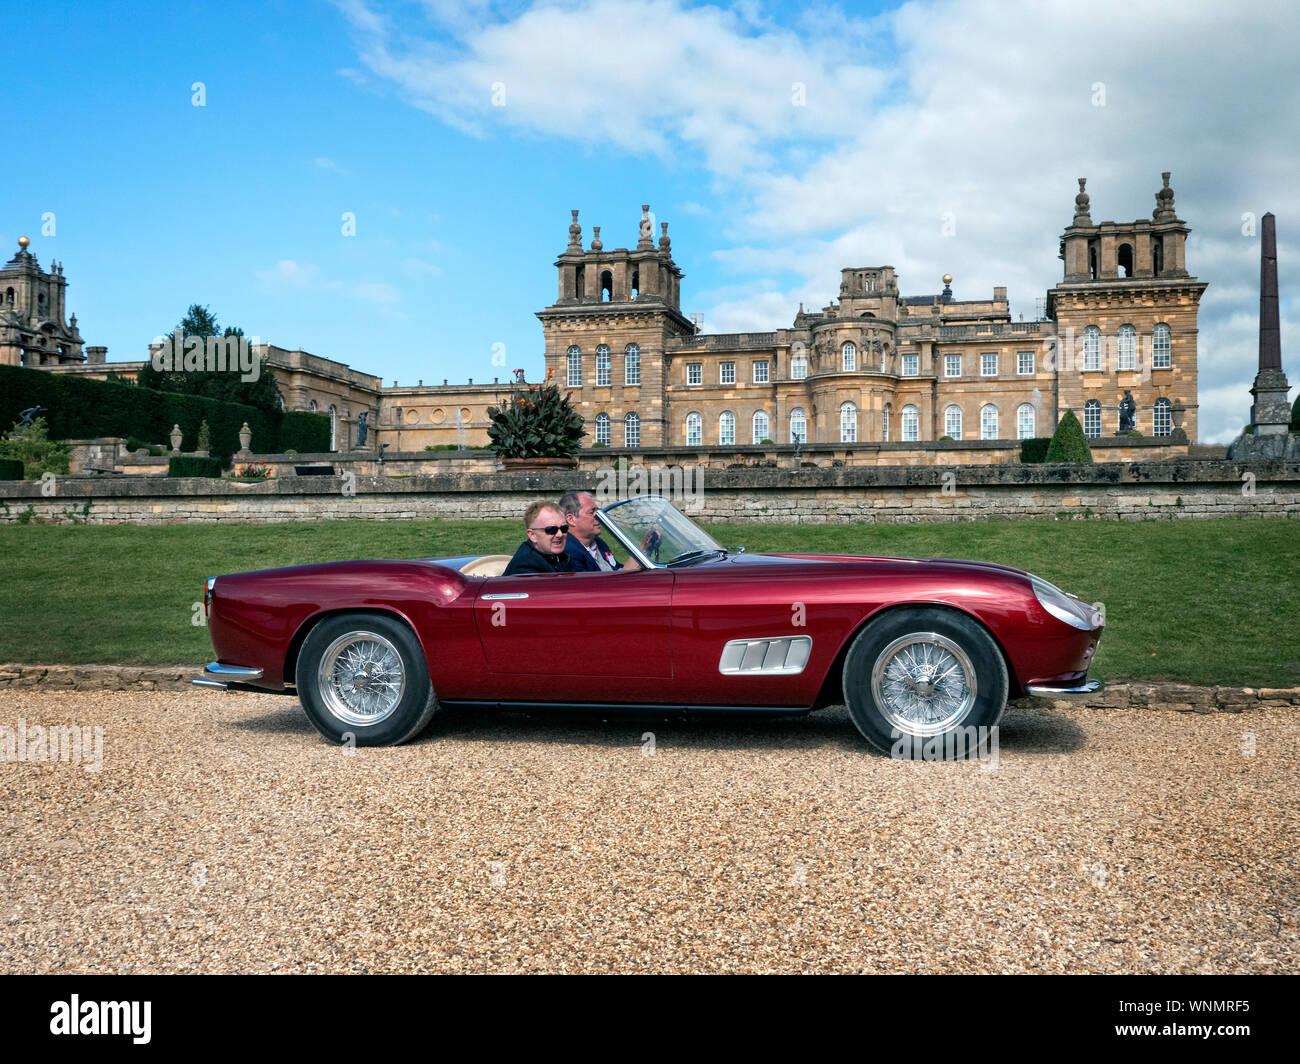 1957 Ferrari 250 Gt Lwb California Spyder Prototyp Im Salon Prive Blenheim Palace 2019 Stockfotografie Alamy